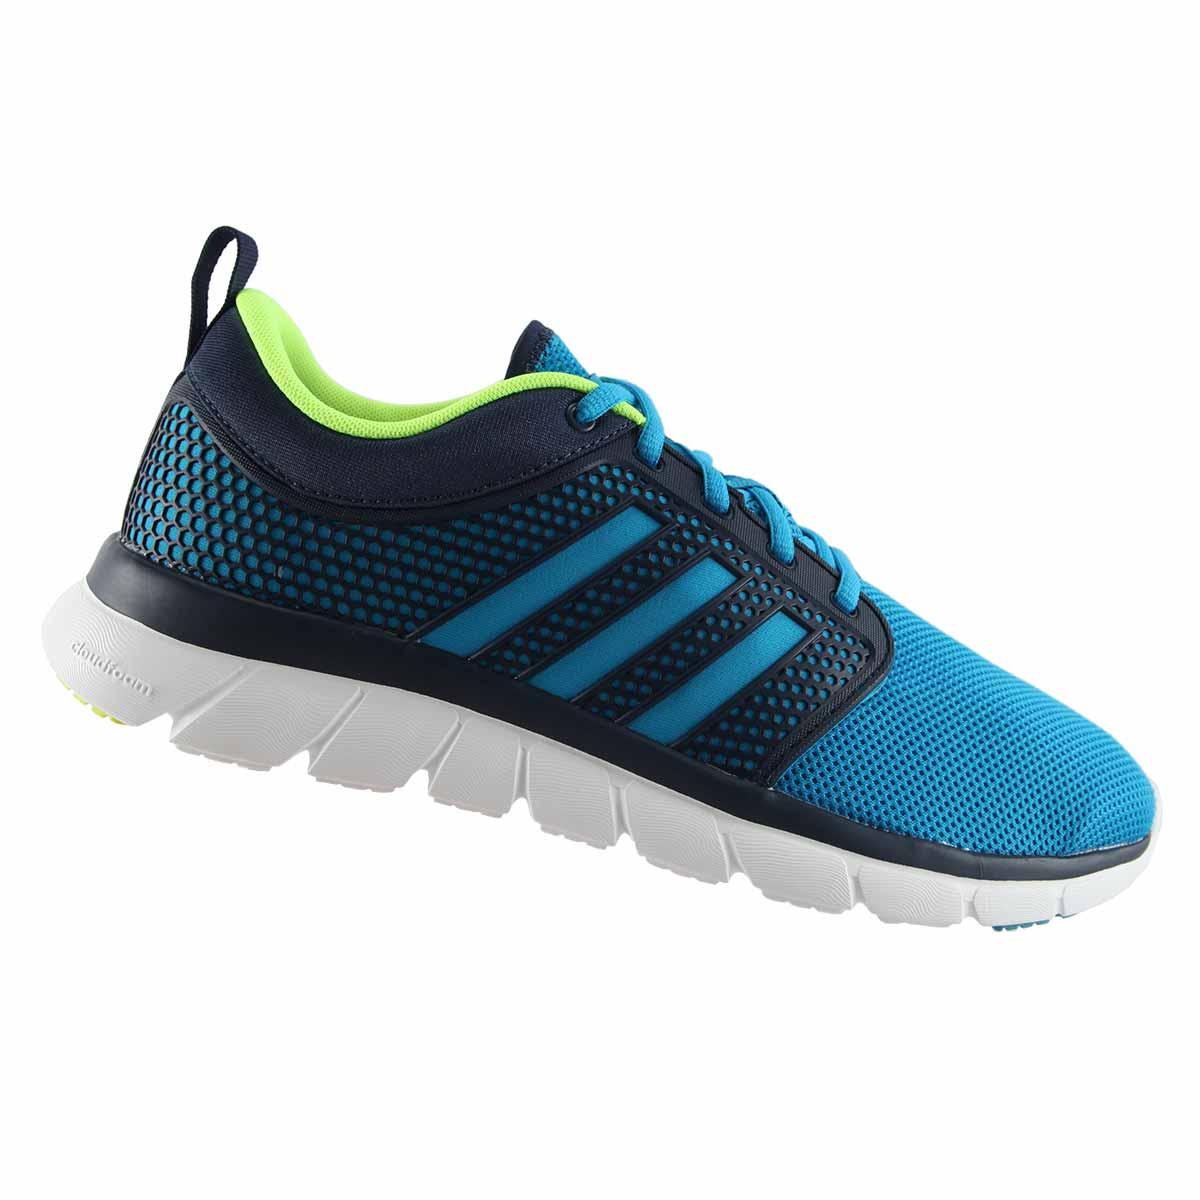 Tênis Adidas Cloudfoam Groove Corrida AQ1427